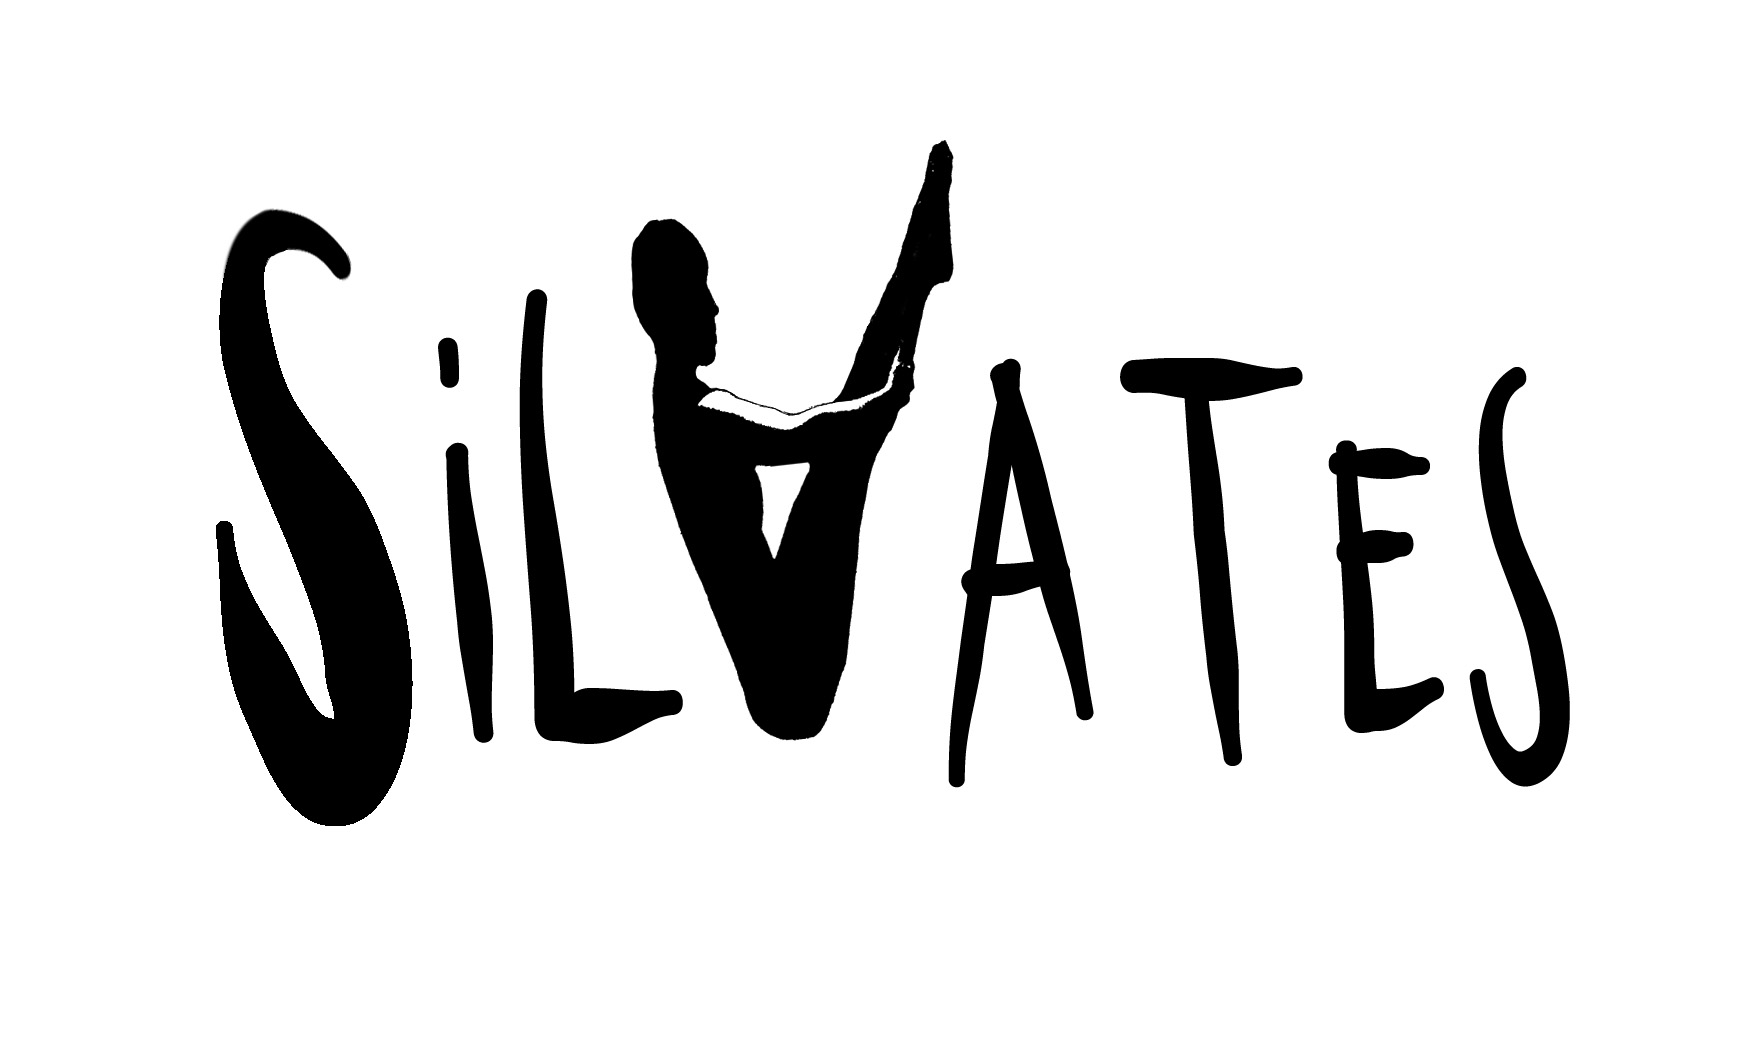 Silvates logo01.jpg